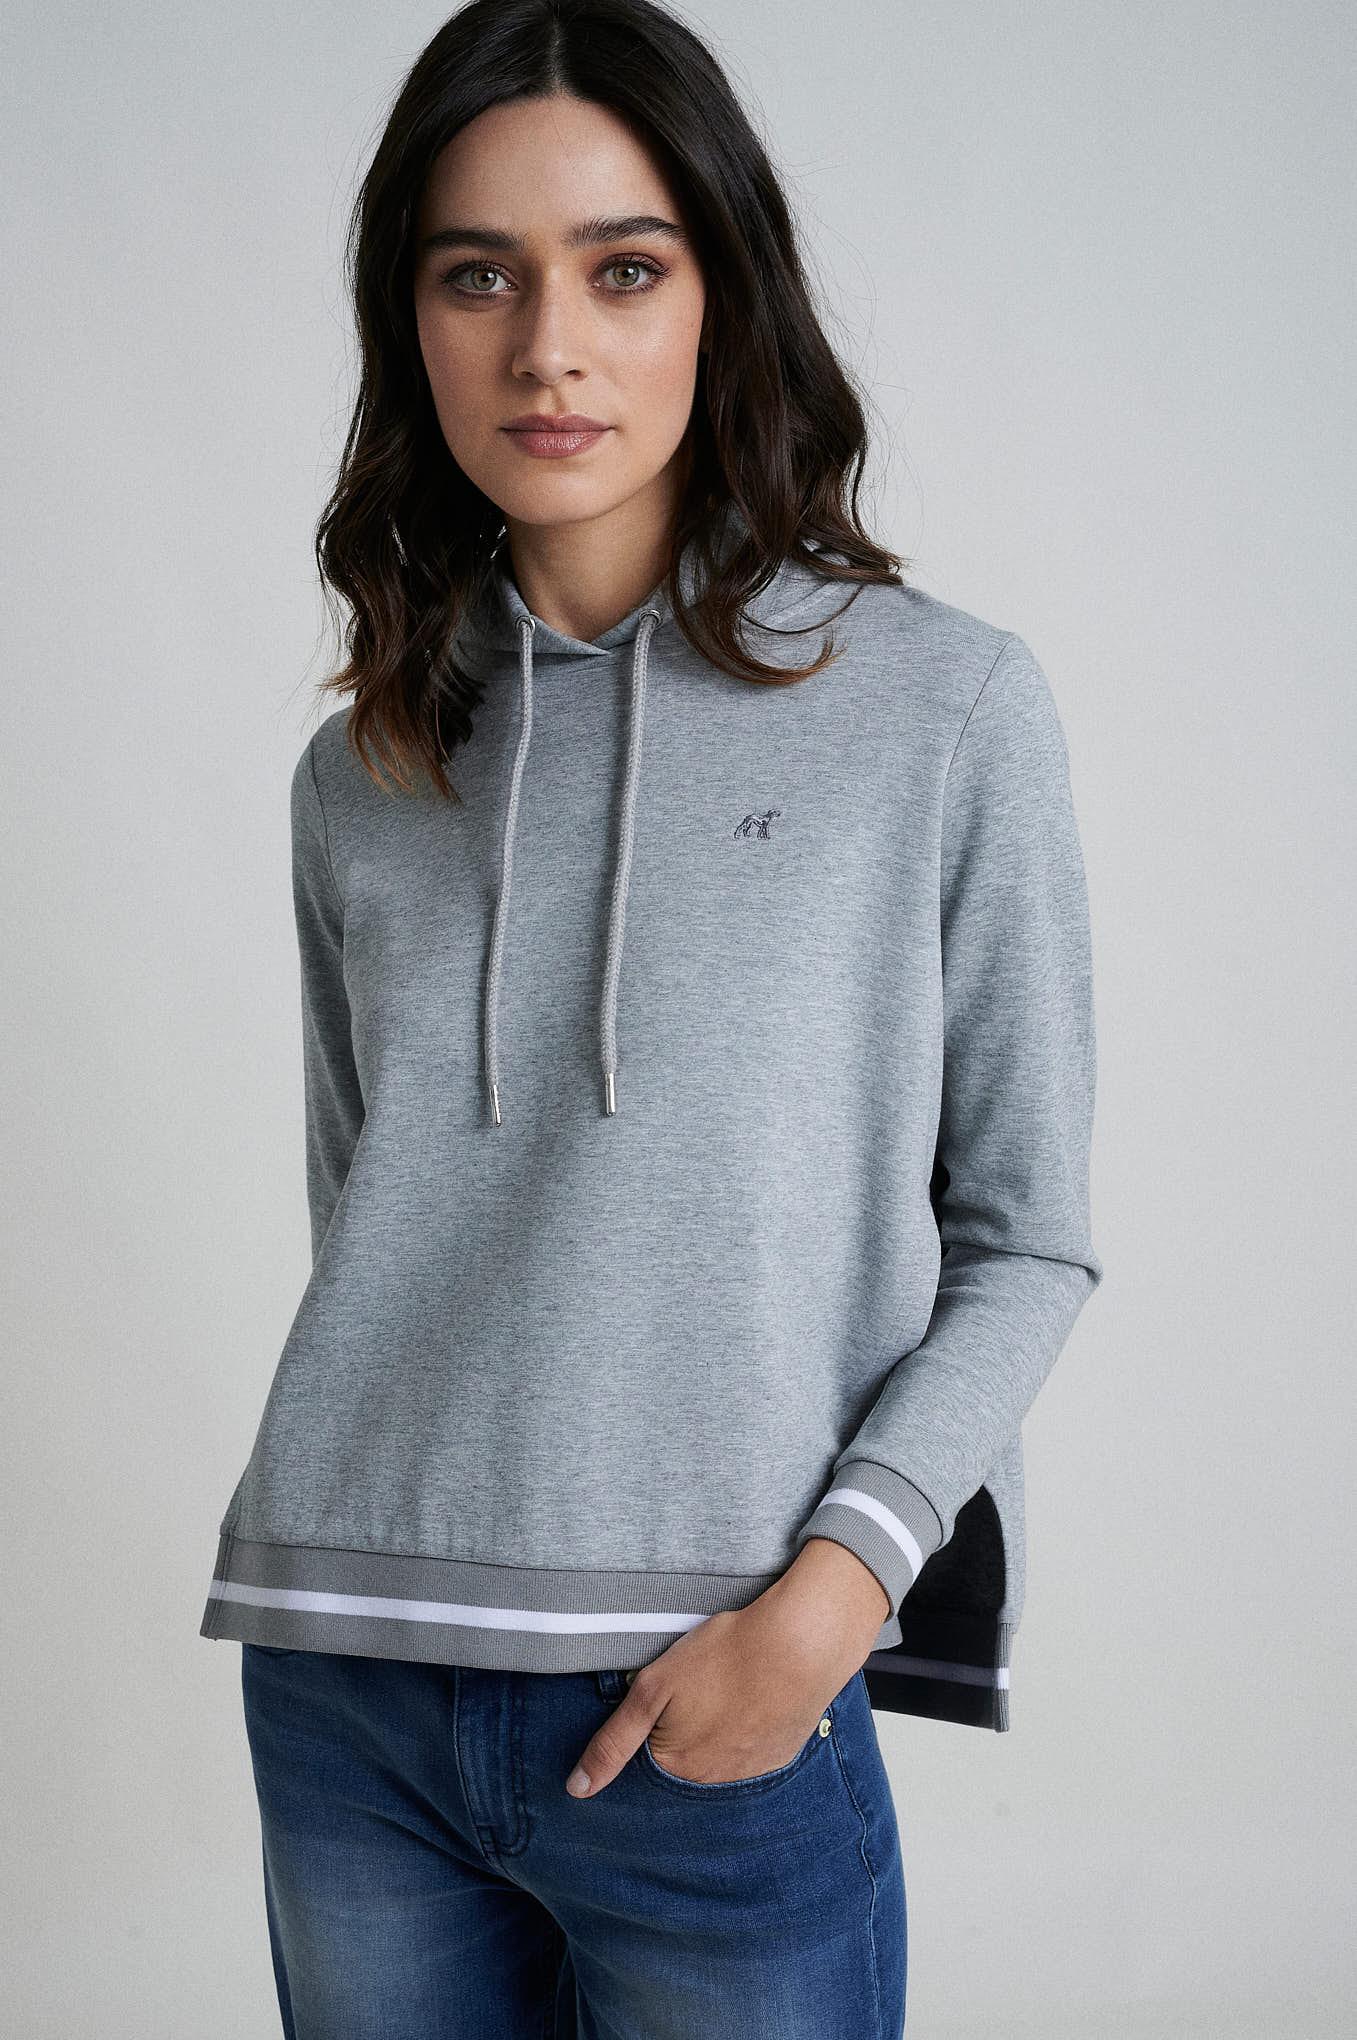 Sweatshirt Mix Grey Sport Woman